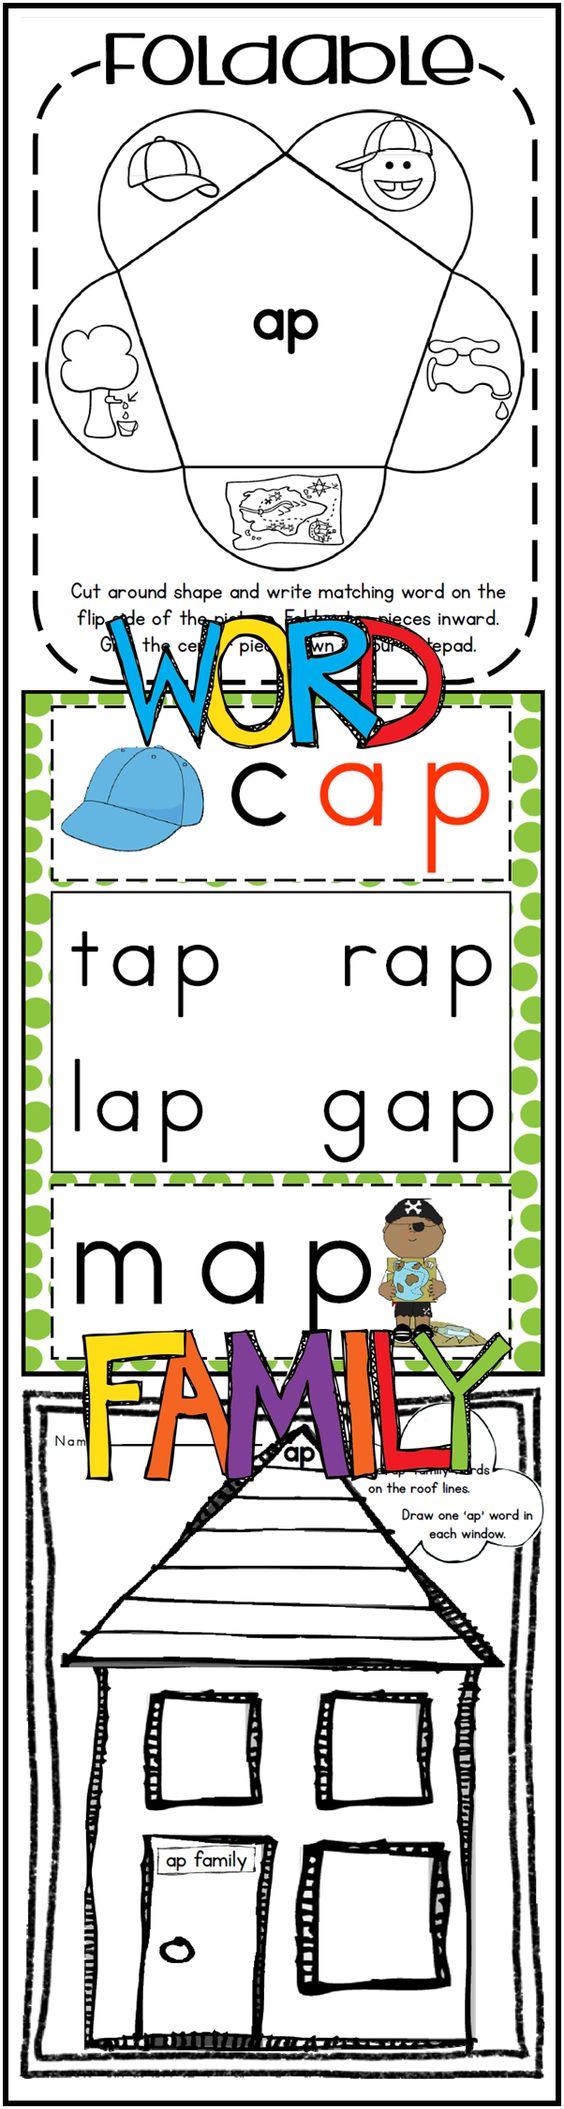 worksheet Ap Word Family Worksheets fantastic and free ap word family resources worksheets worksheets